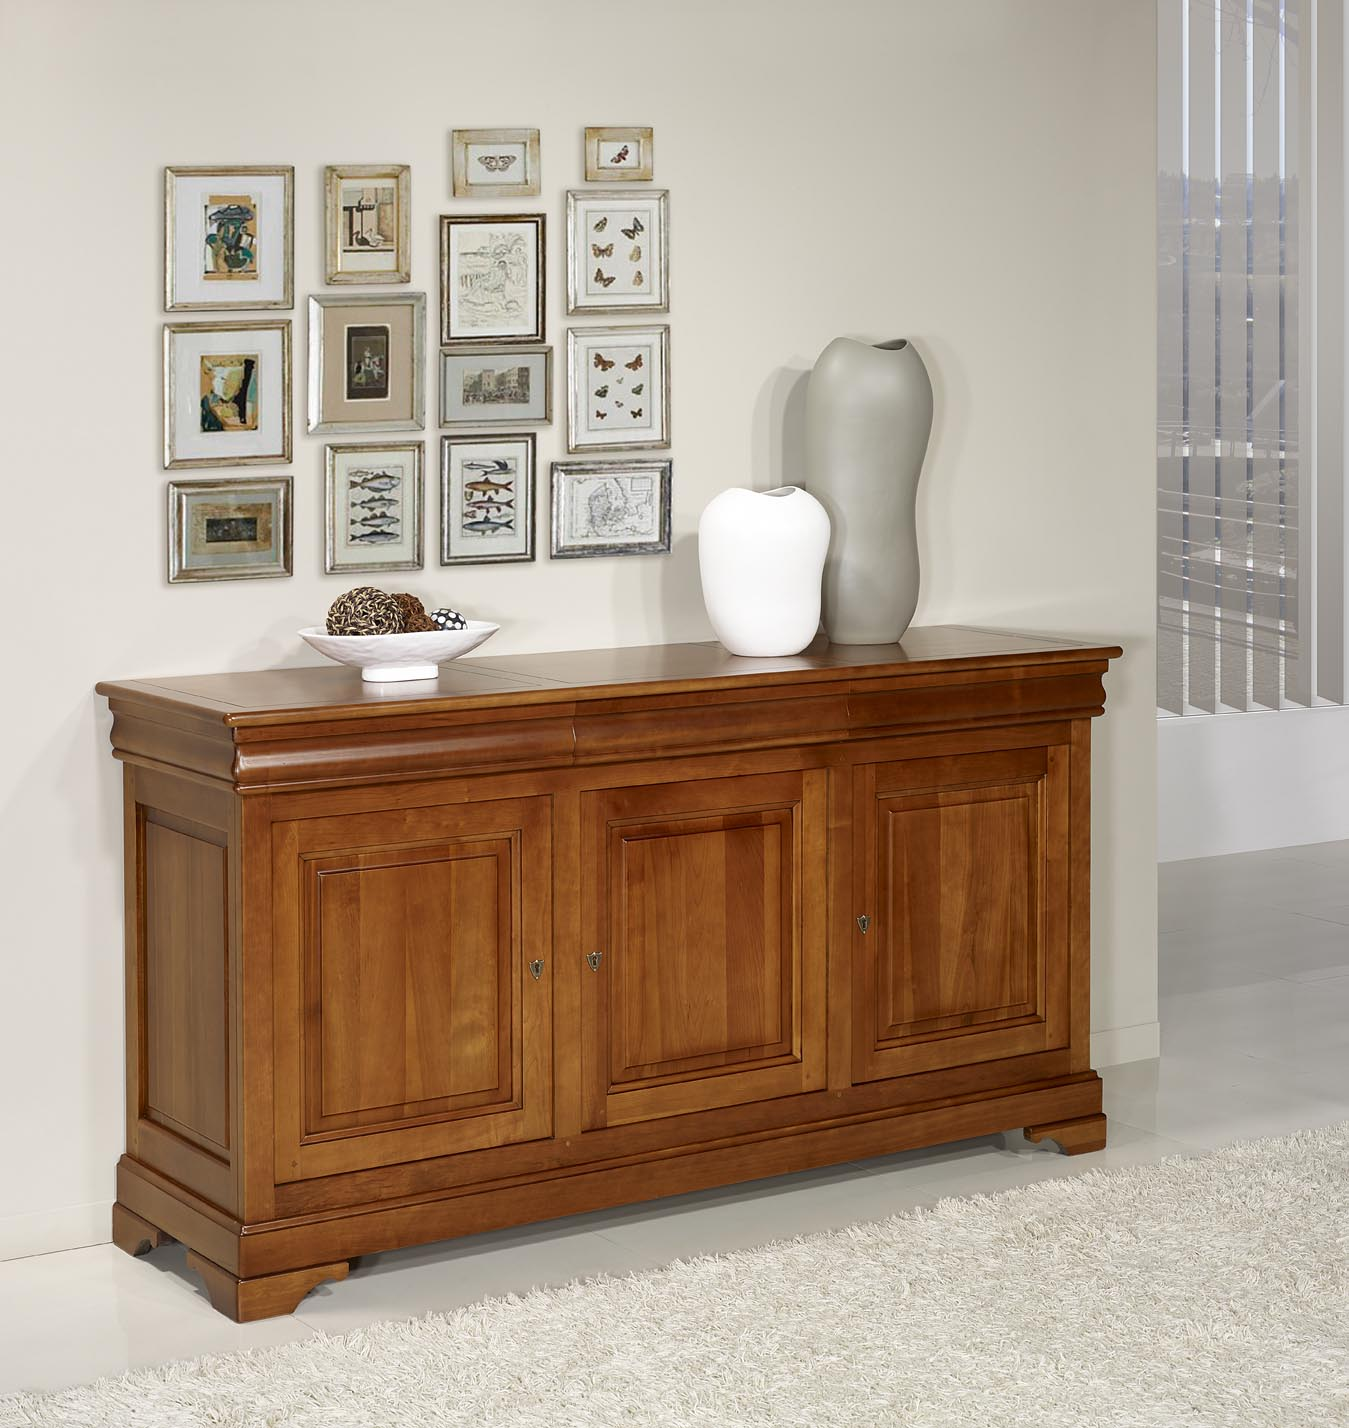 buffet 3 portes 3 tiroirs en merisier massif de style louis philippe meuble en merisier massif. Black Bedroom Furniture Sets. Home Design Ideas